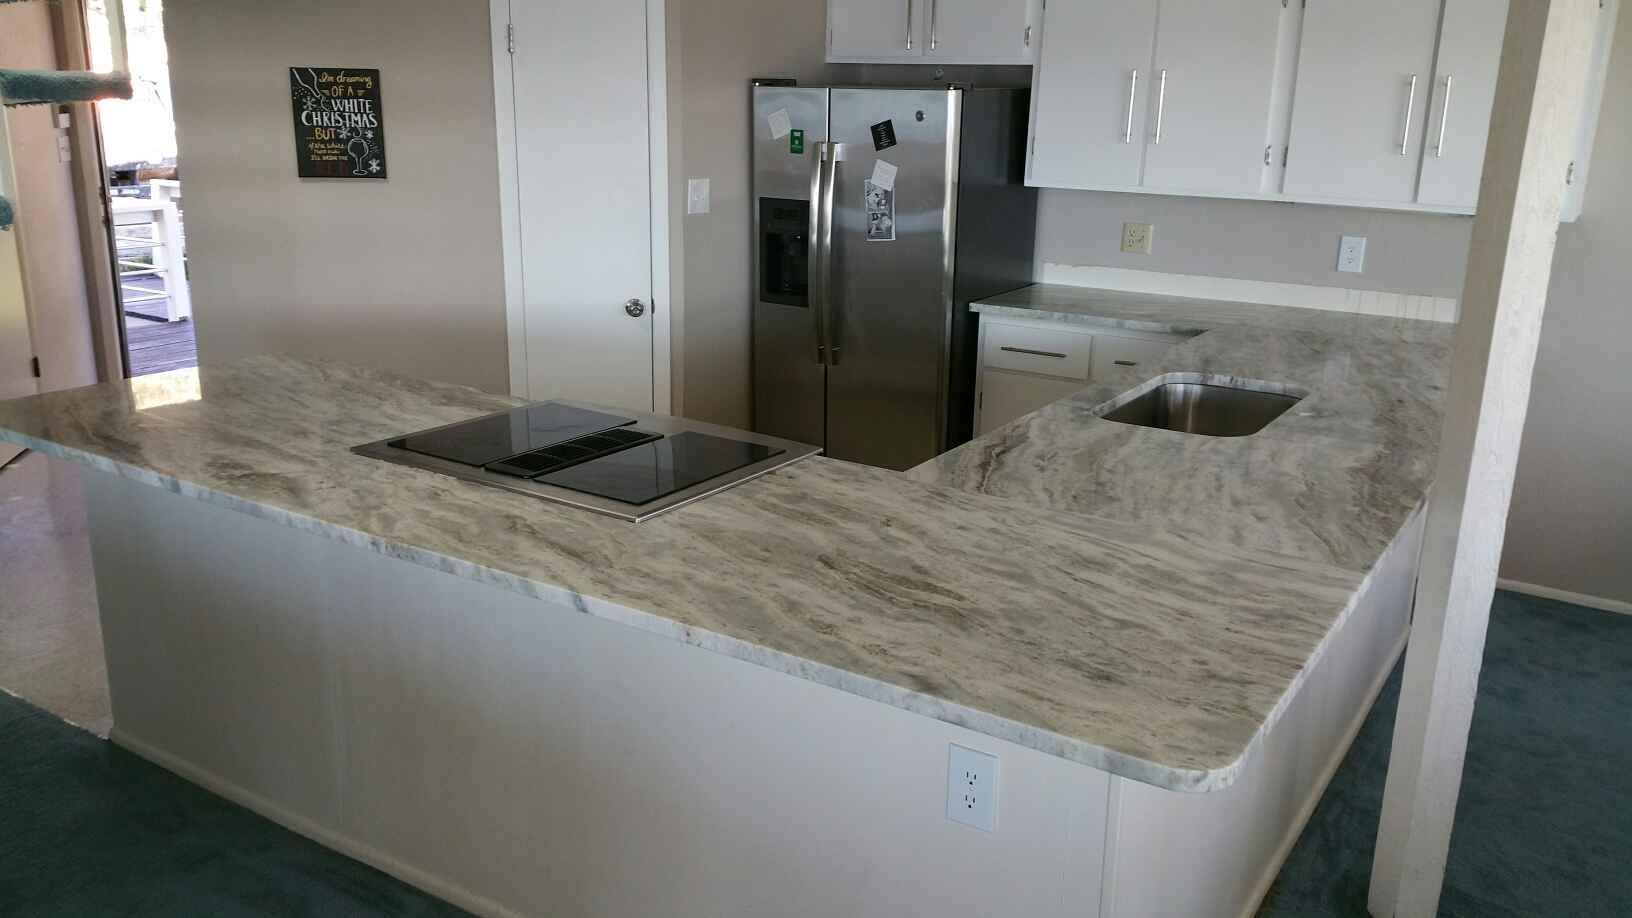 Countertops are fantasy brown granite the backsplash is marble - Sequoia Or Fantasy Brown Granite Lake House White Cabinets White Granite Home